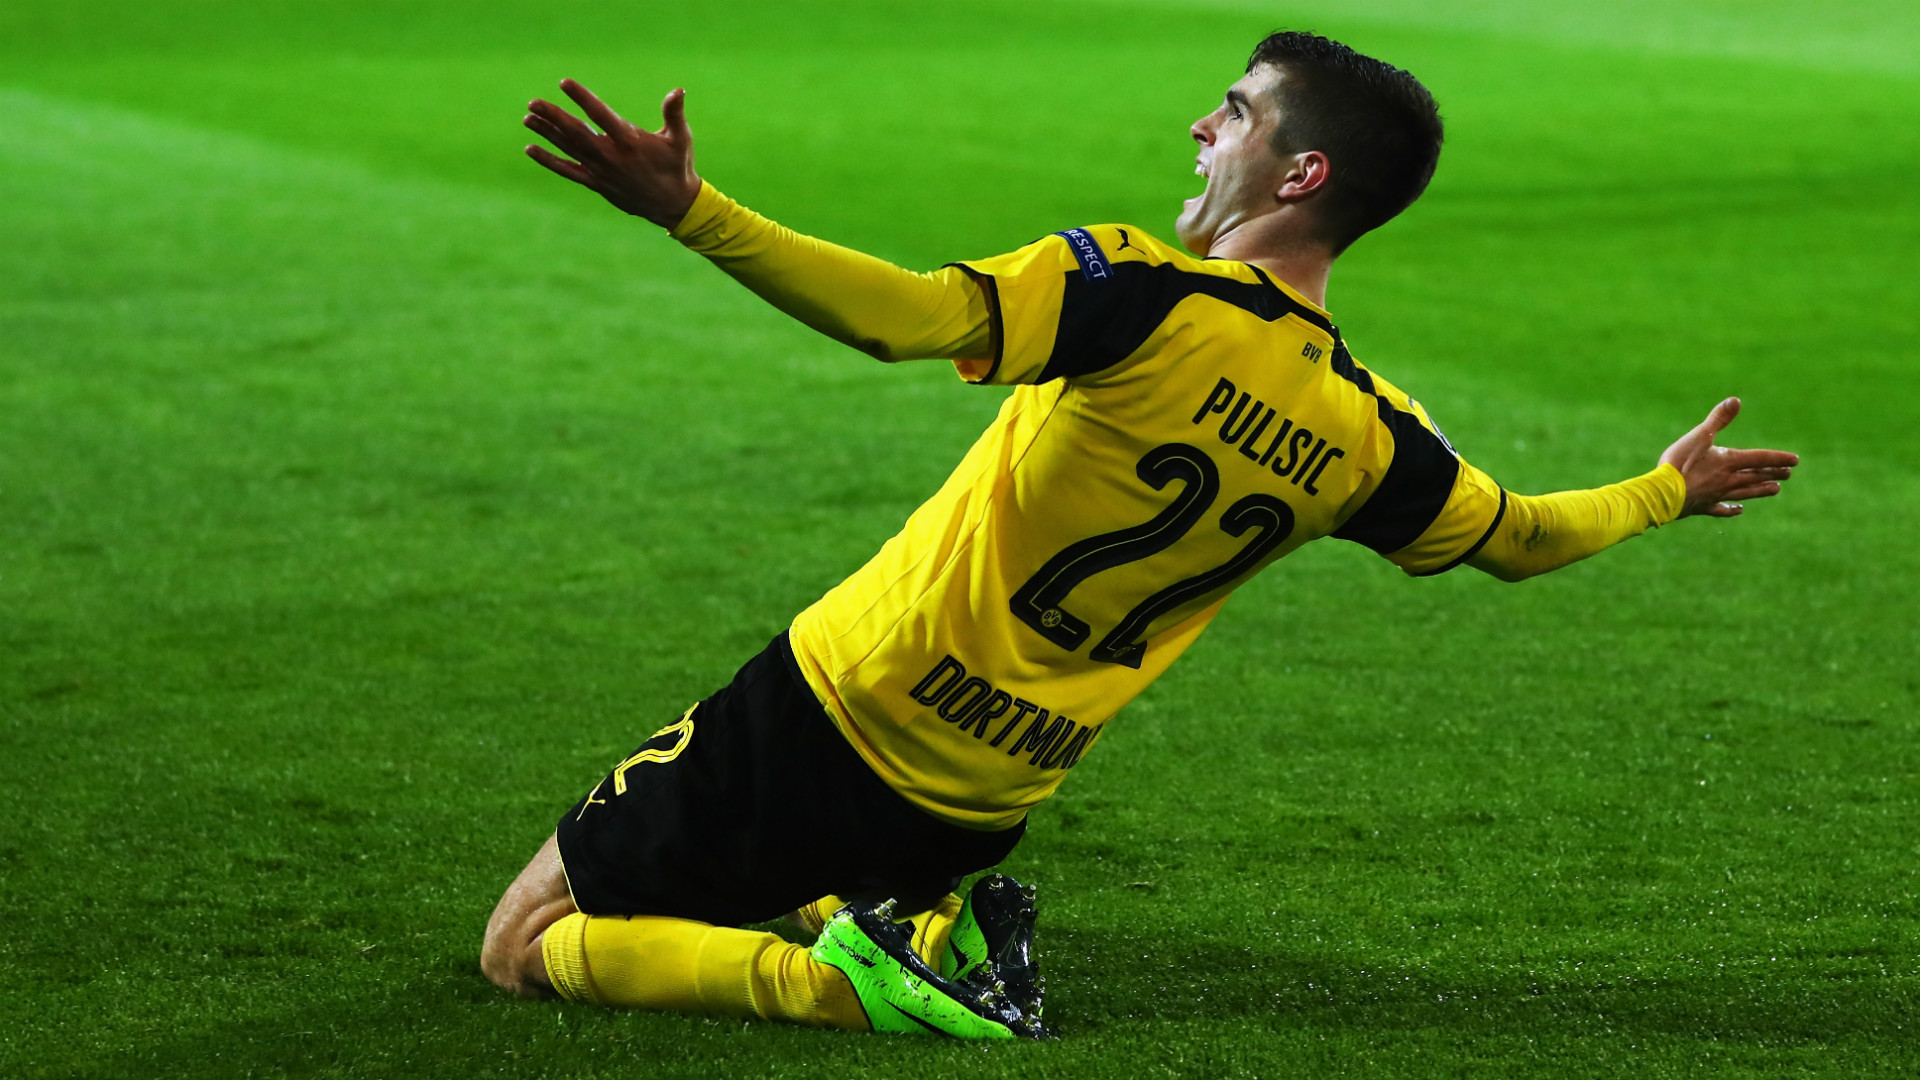 Christian Pulisic Borussia Dortmund Champions League